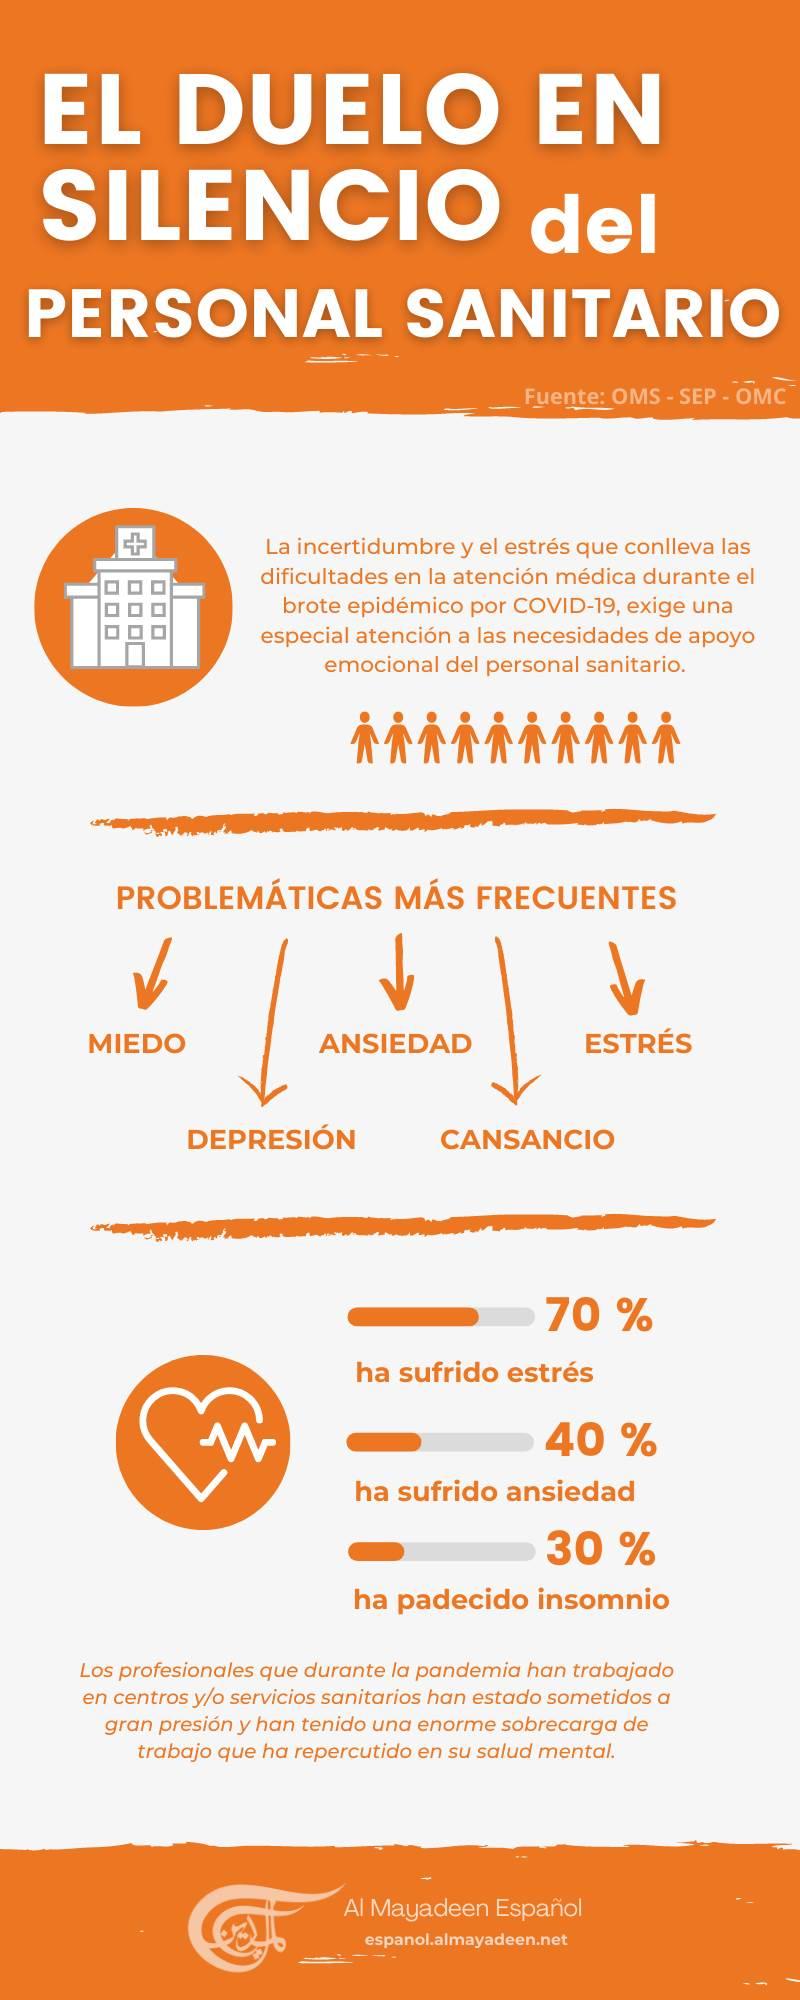 Infografía: Al Mayadeen Español